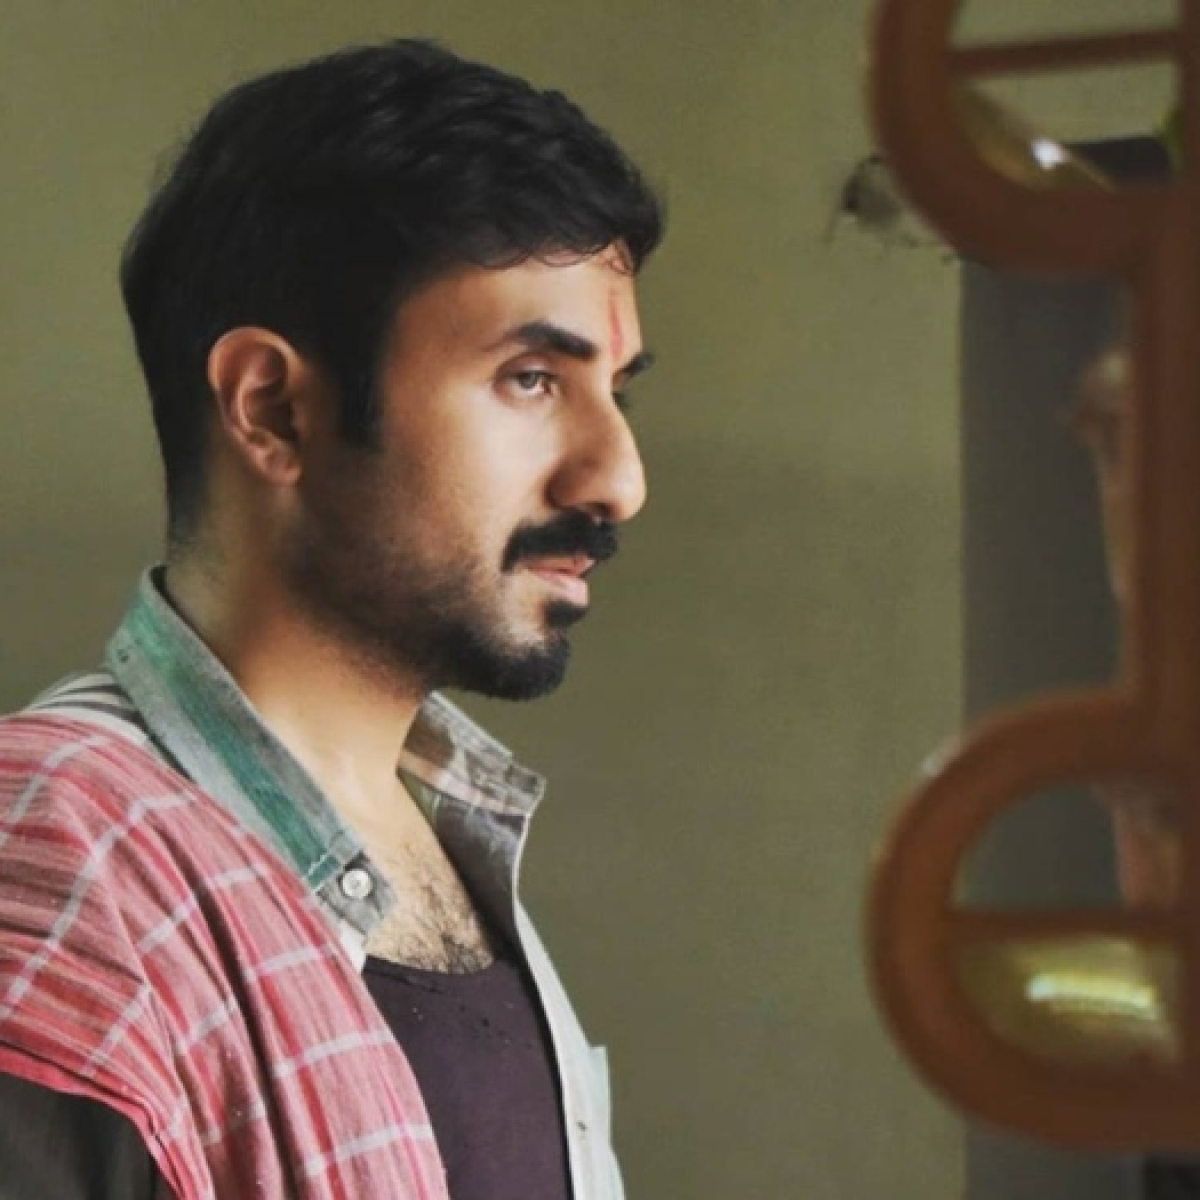 Delhi HC declines to grant interim stay on airing of Vir Das' Netflix series 'Hasmukh'